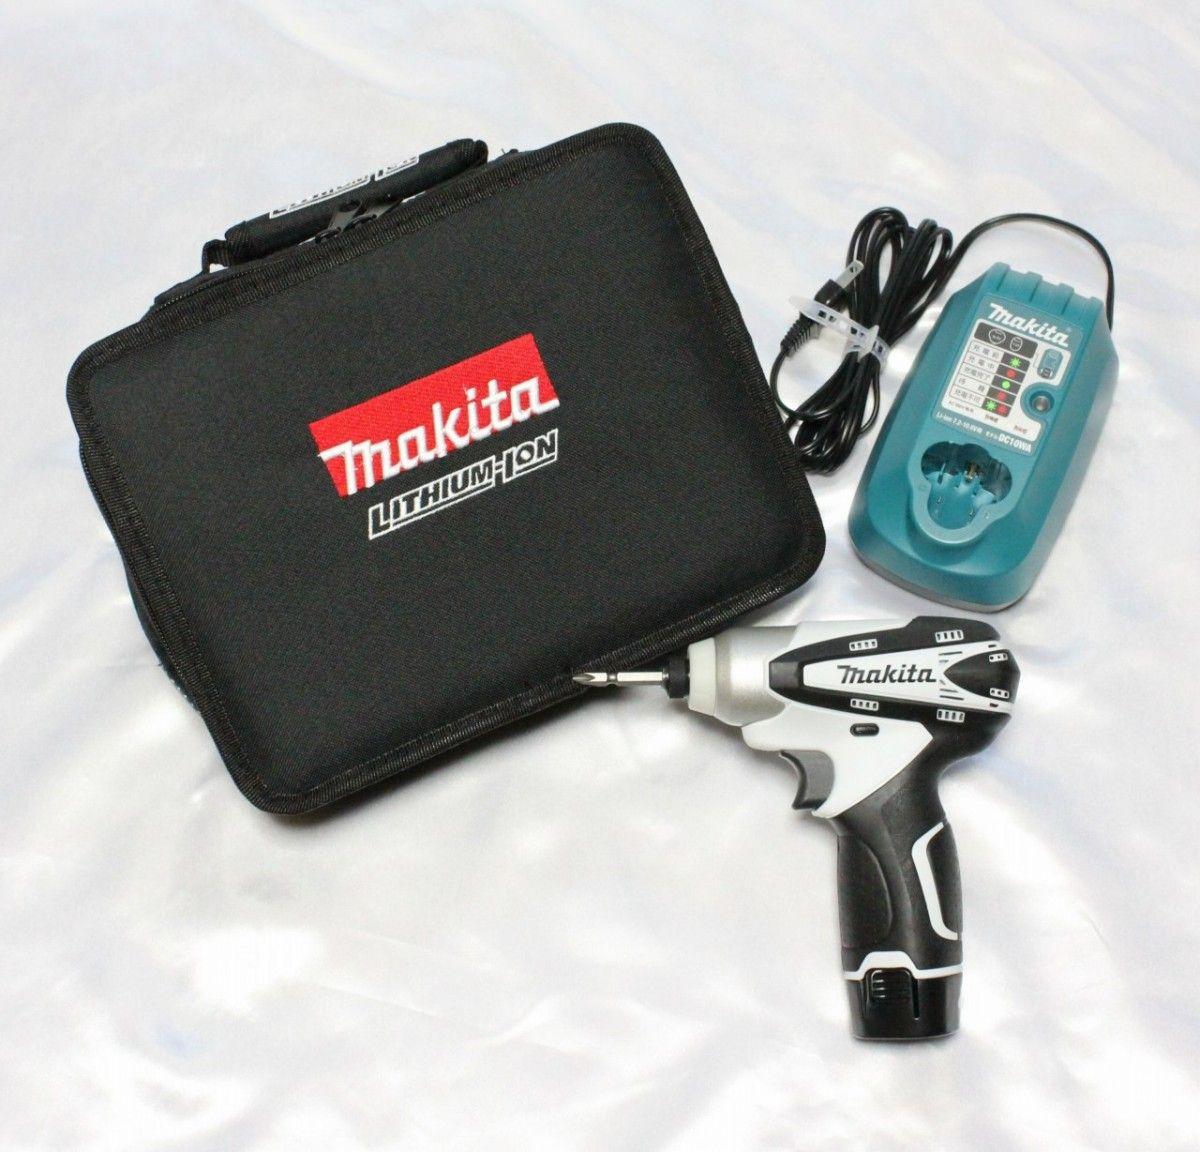 makita マキタ 充電式インパクトドライバ 10.8V TD090DWSPW